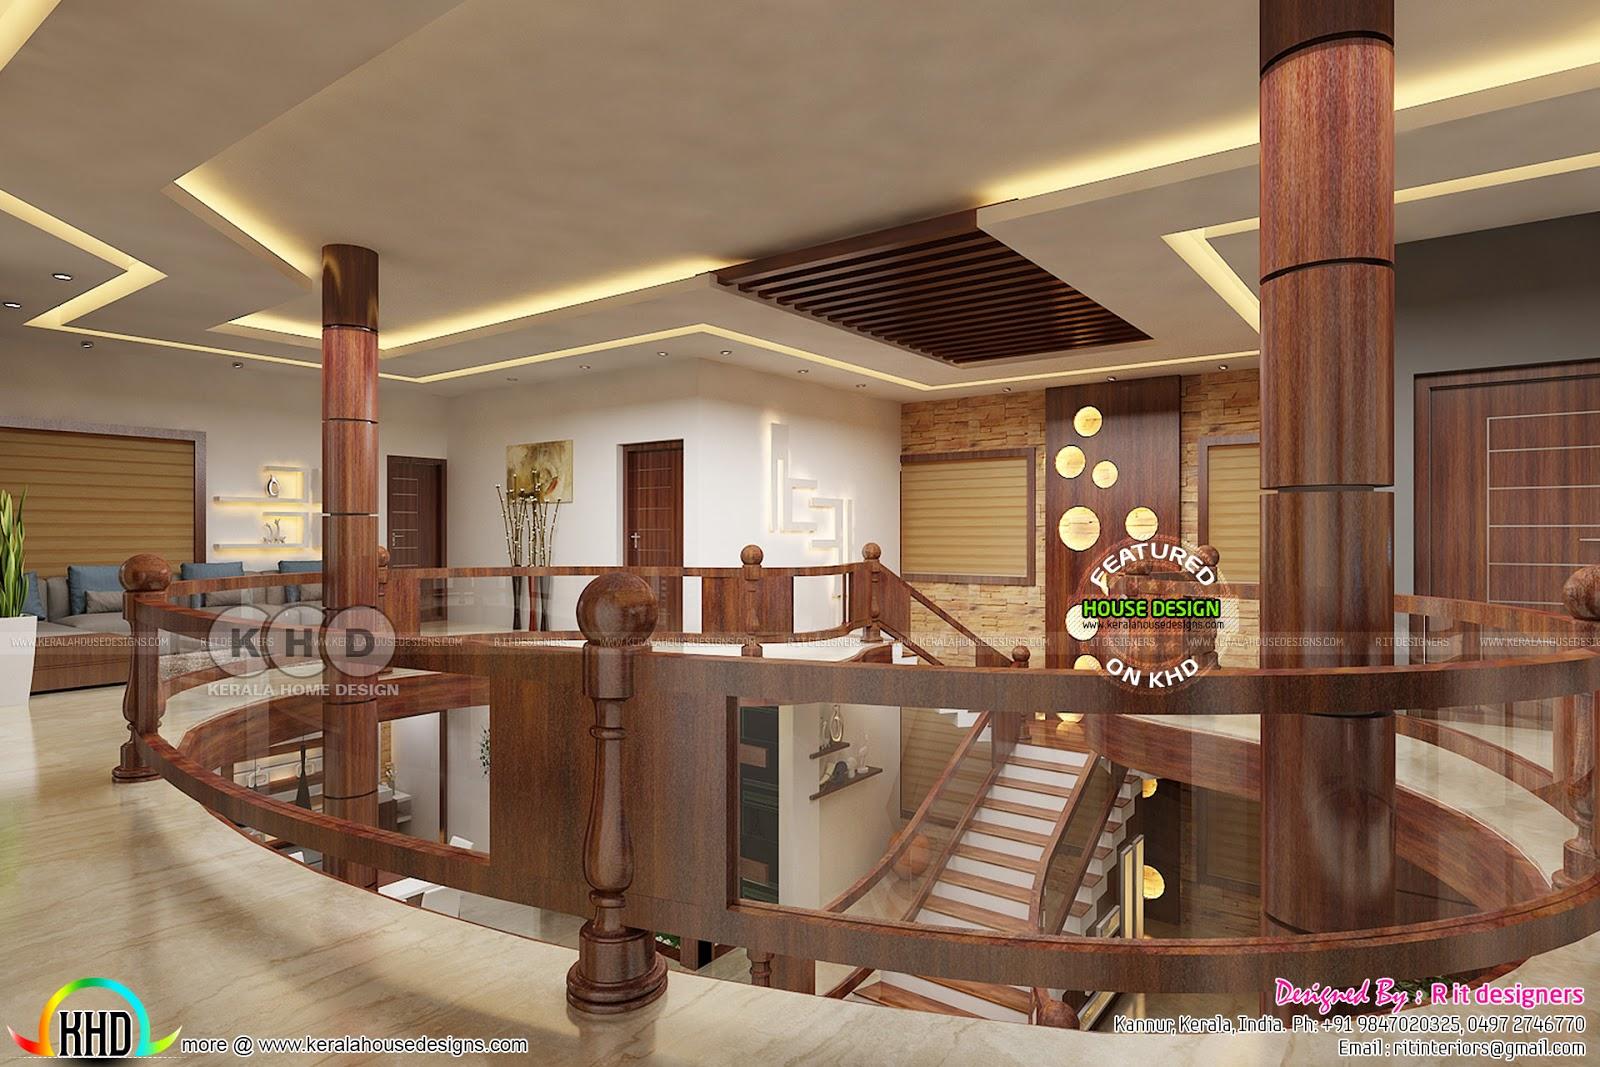 Upper floor interior designs by Rit interiors - Kerala ...